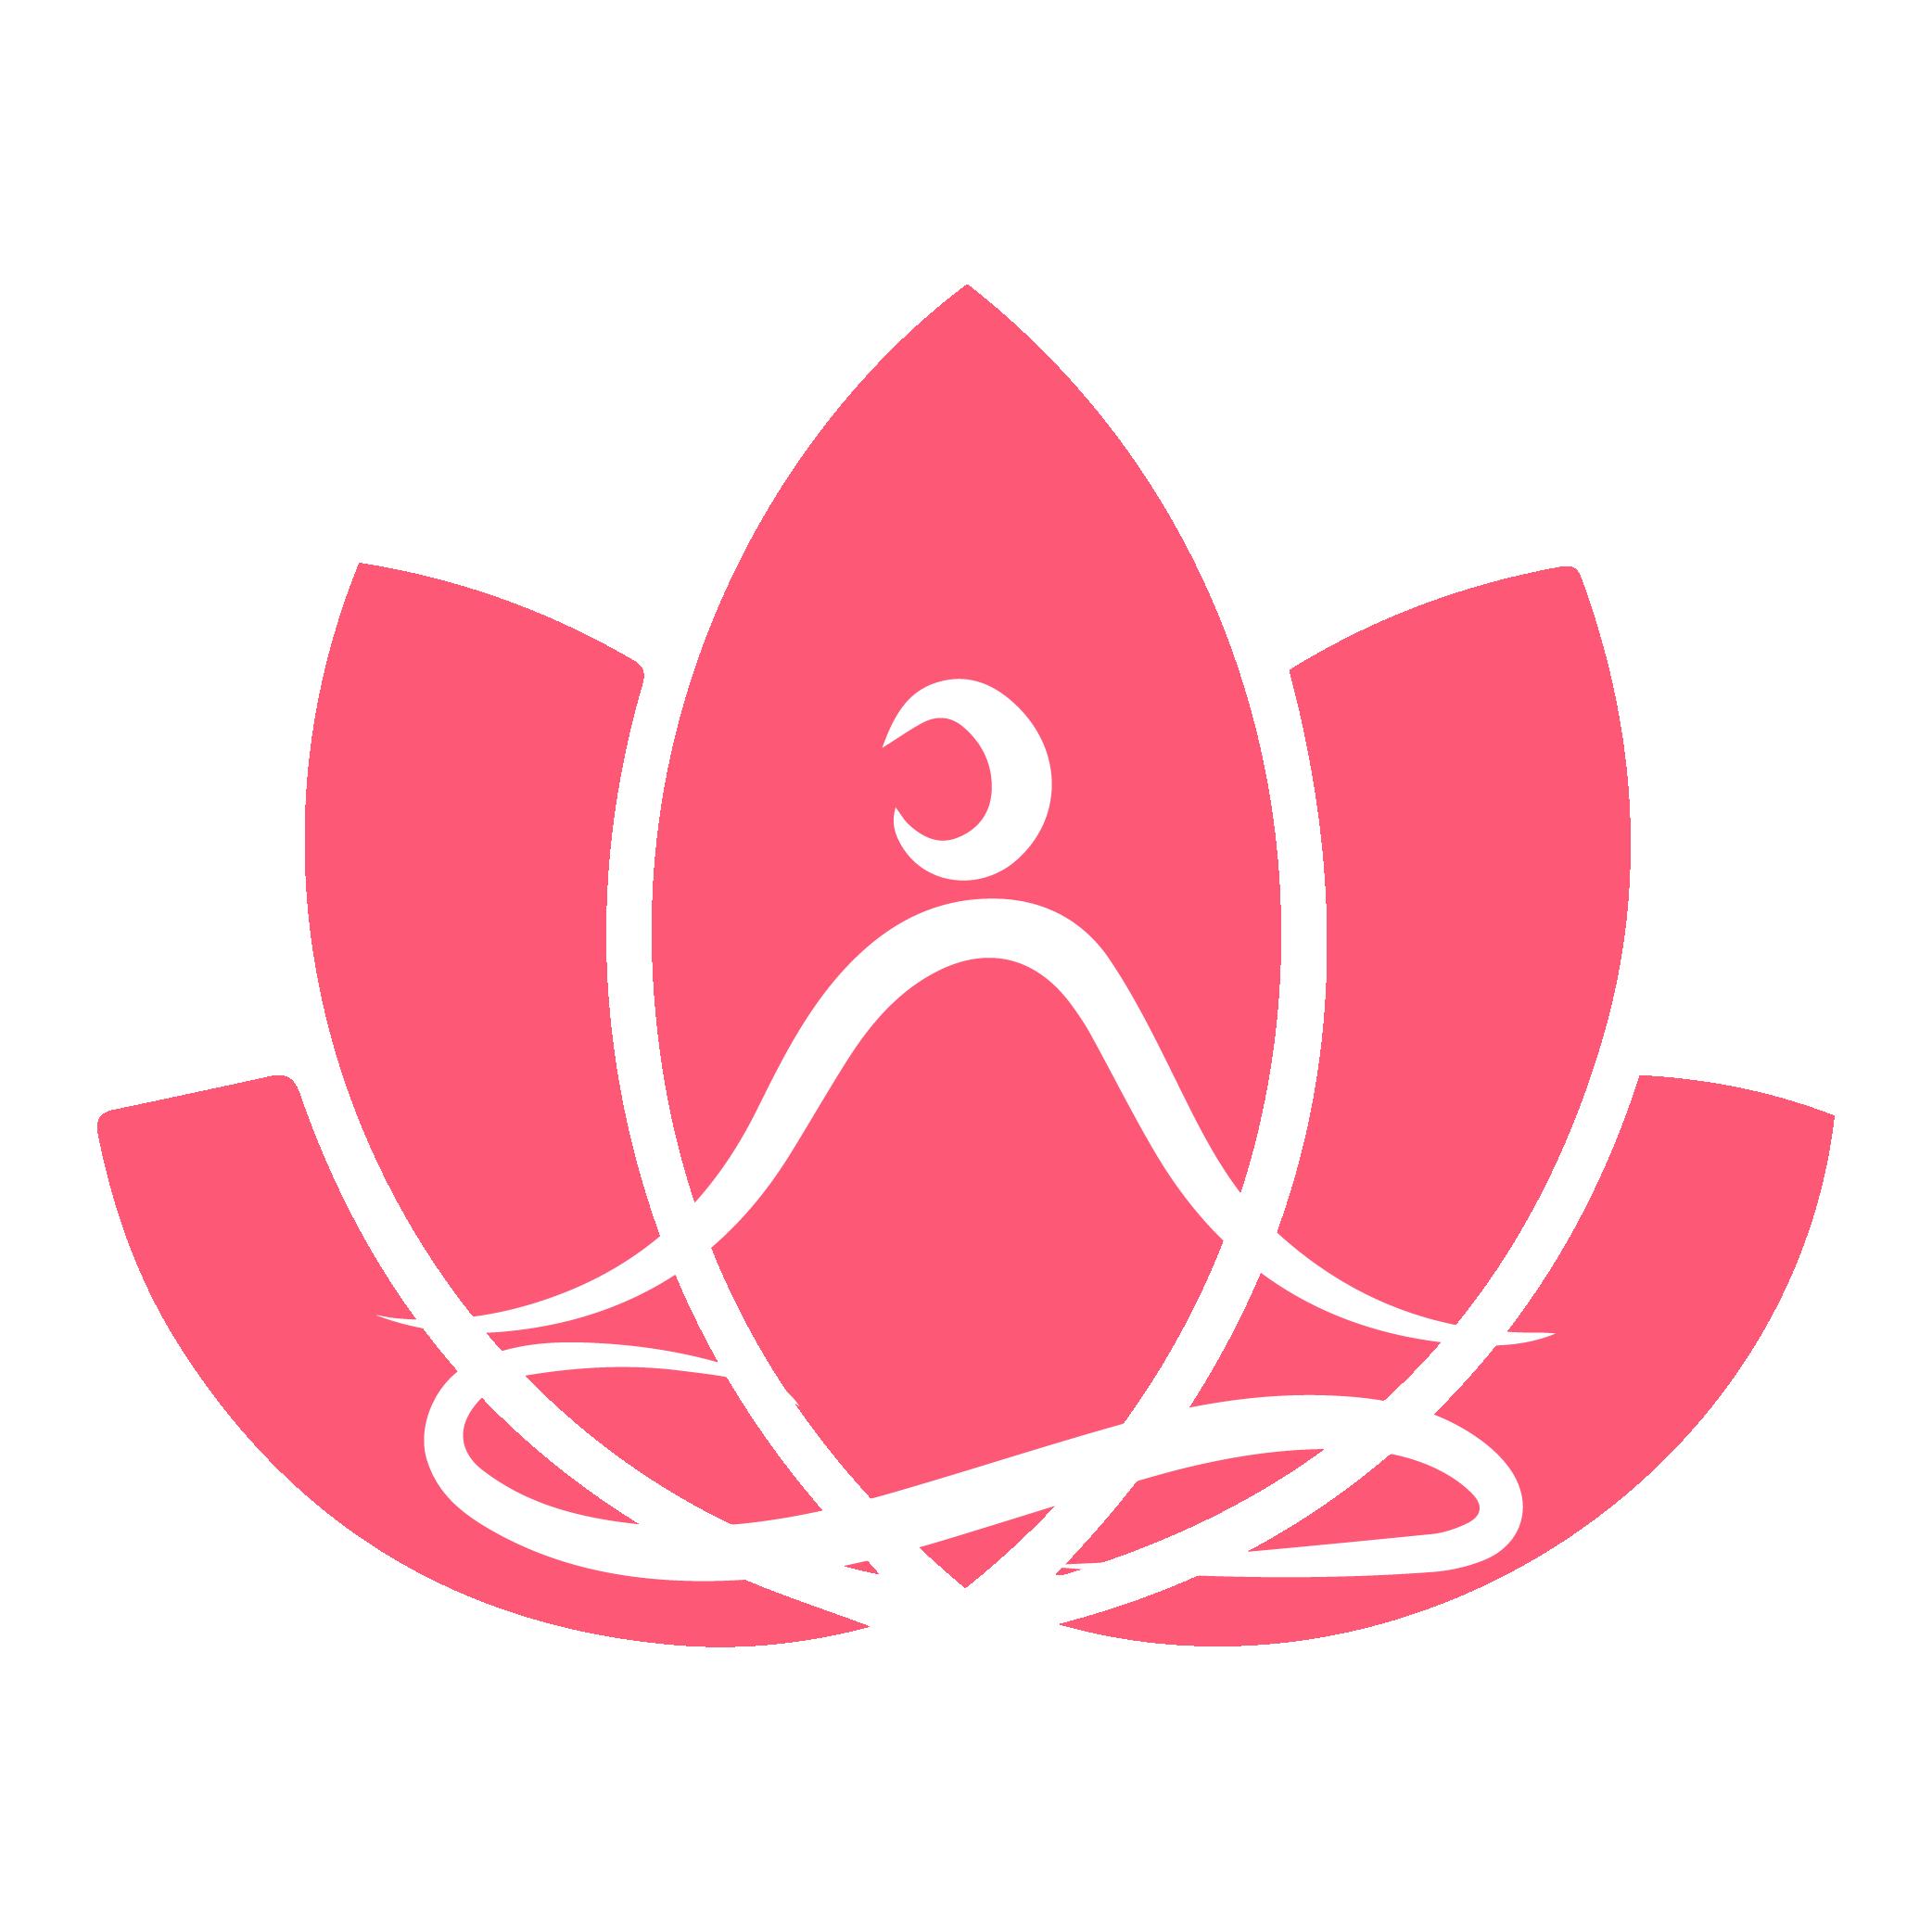 https://kamlayoga.com/wp-content/uploads/2020/03/logo-nidra-yoga.png